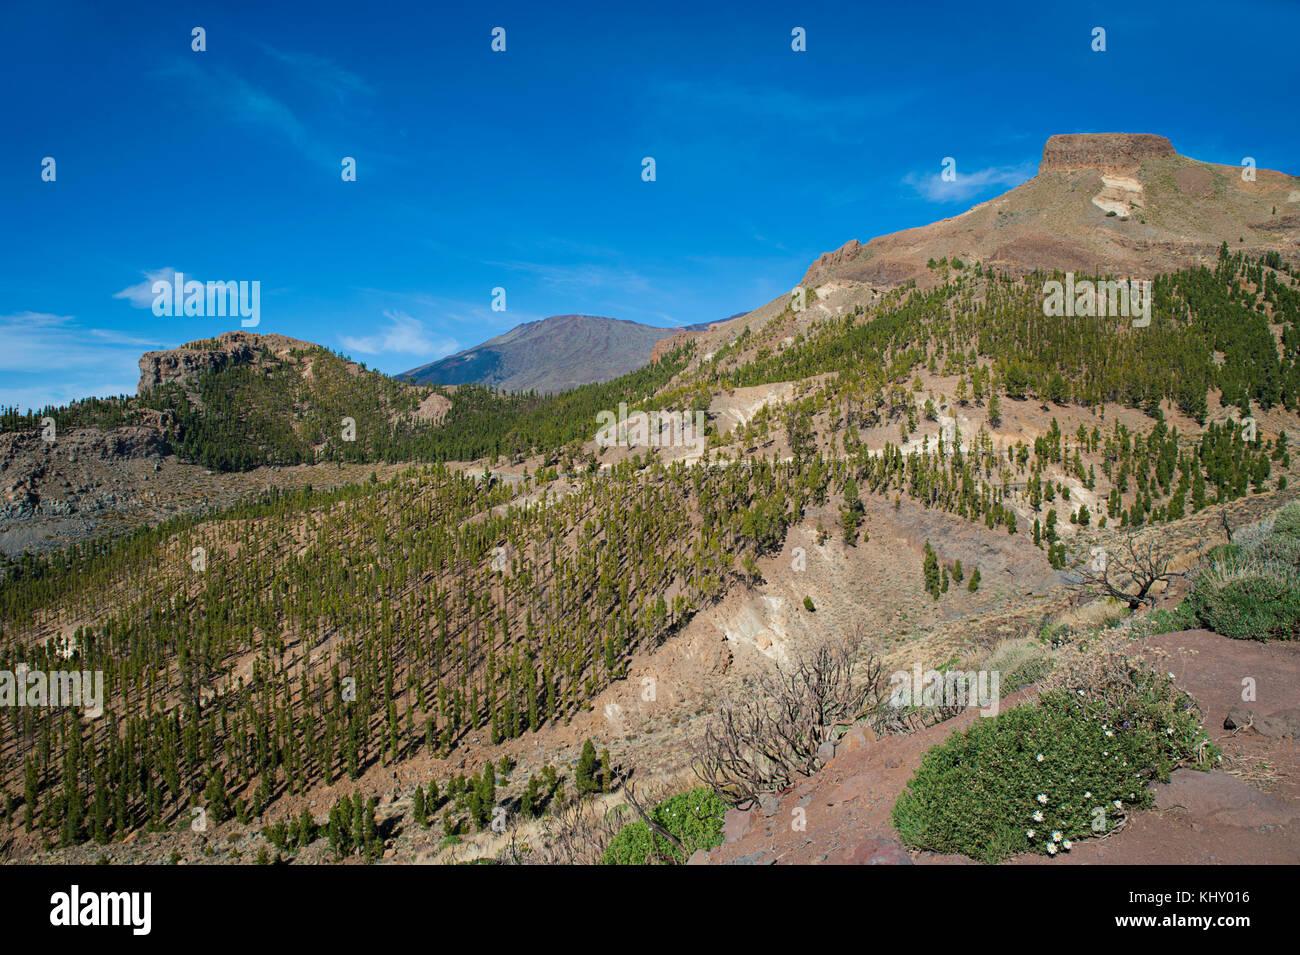 Familiar volcanic landscape of Teide National Park, Tenerife, Canary Islands, Spain - Stock Image